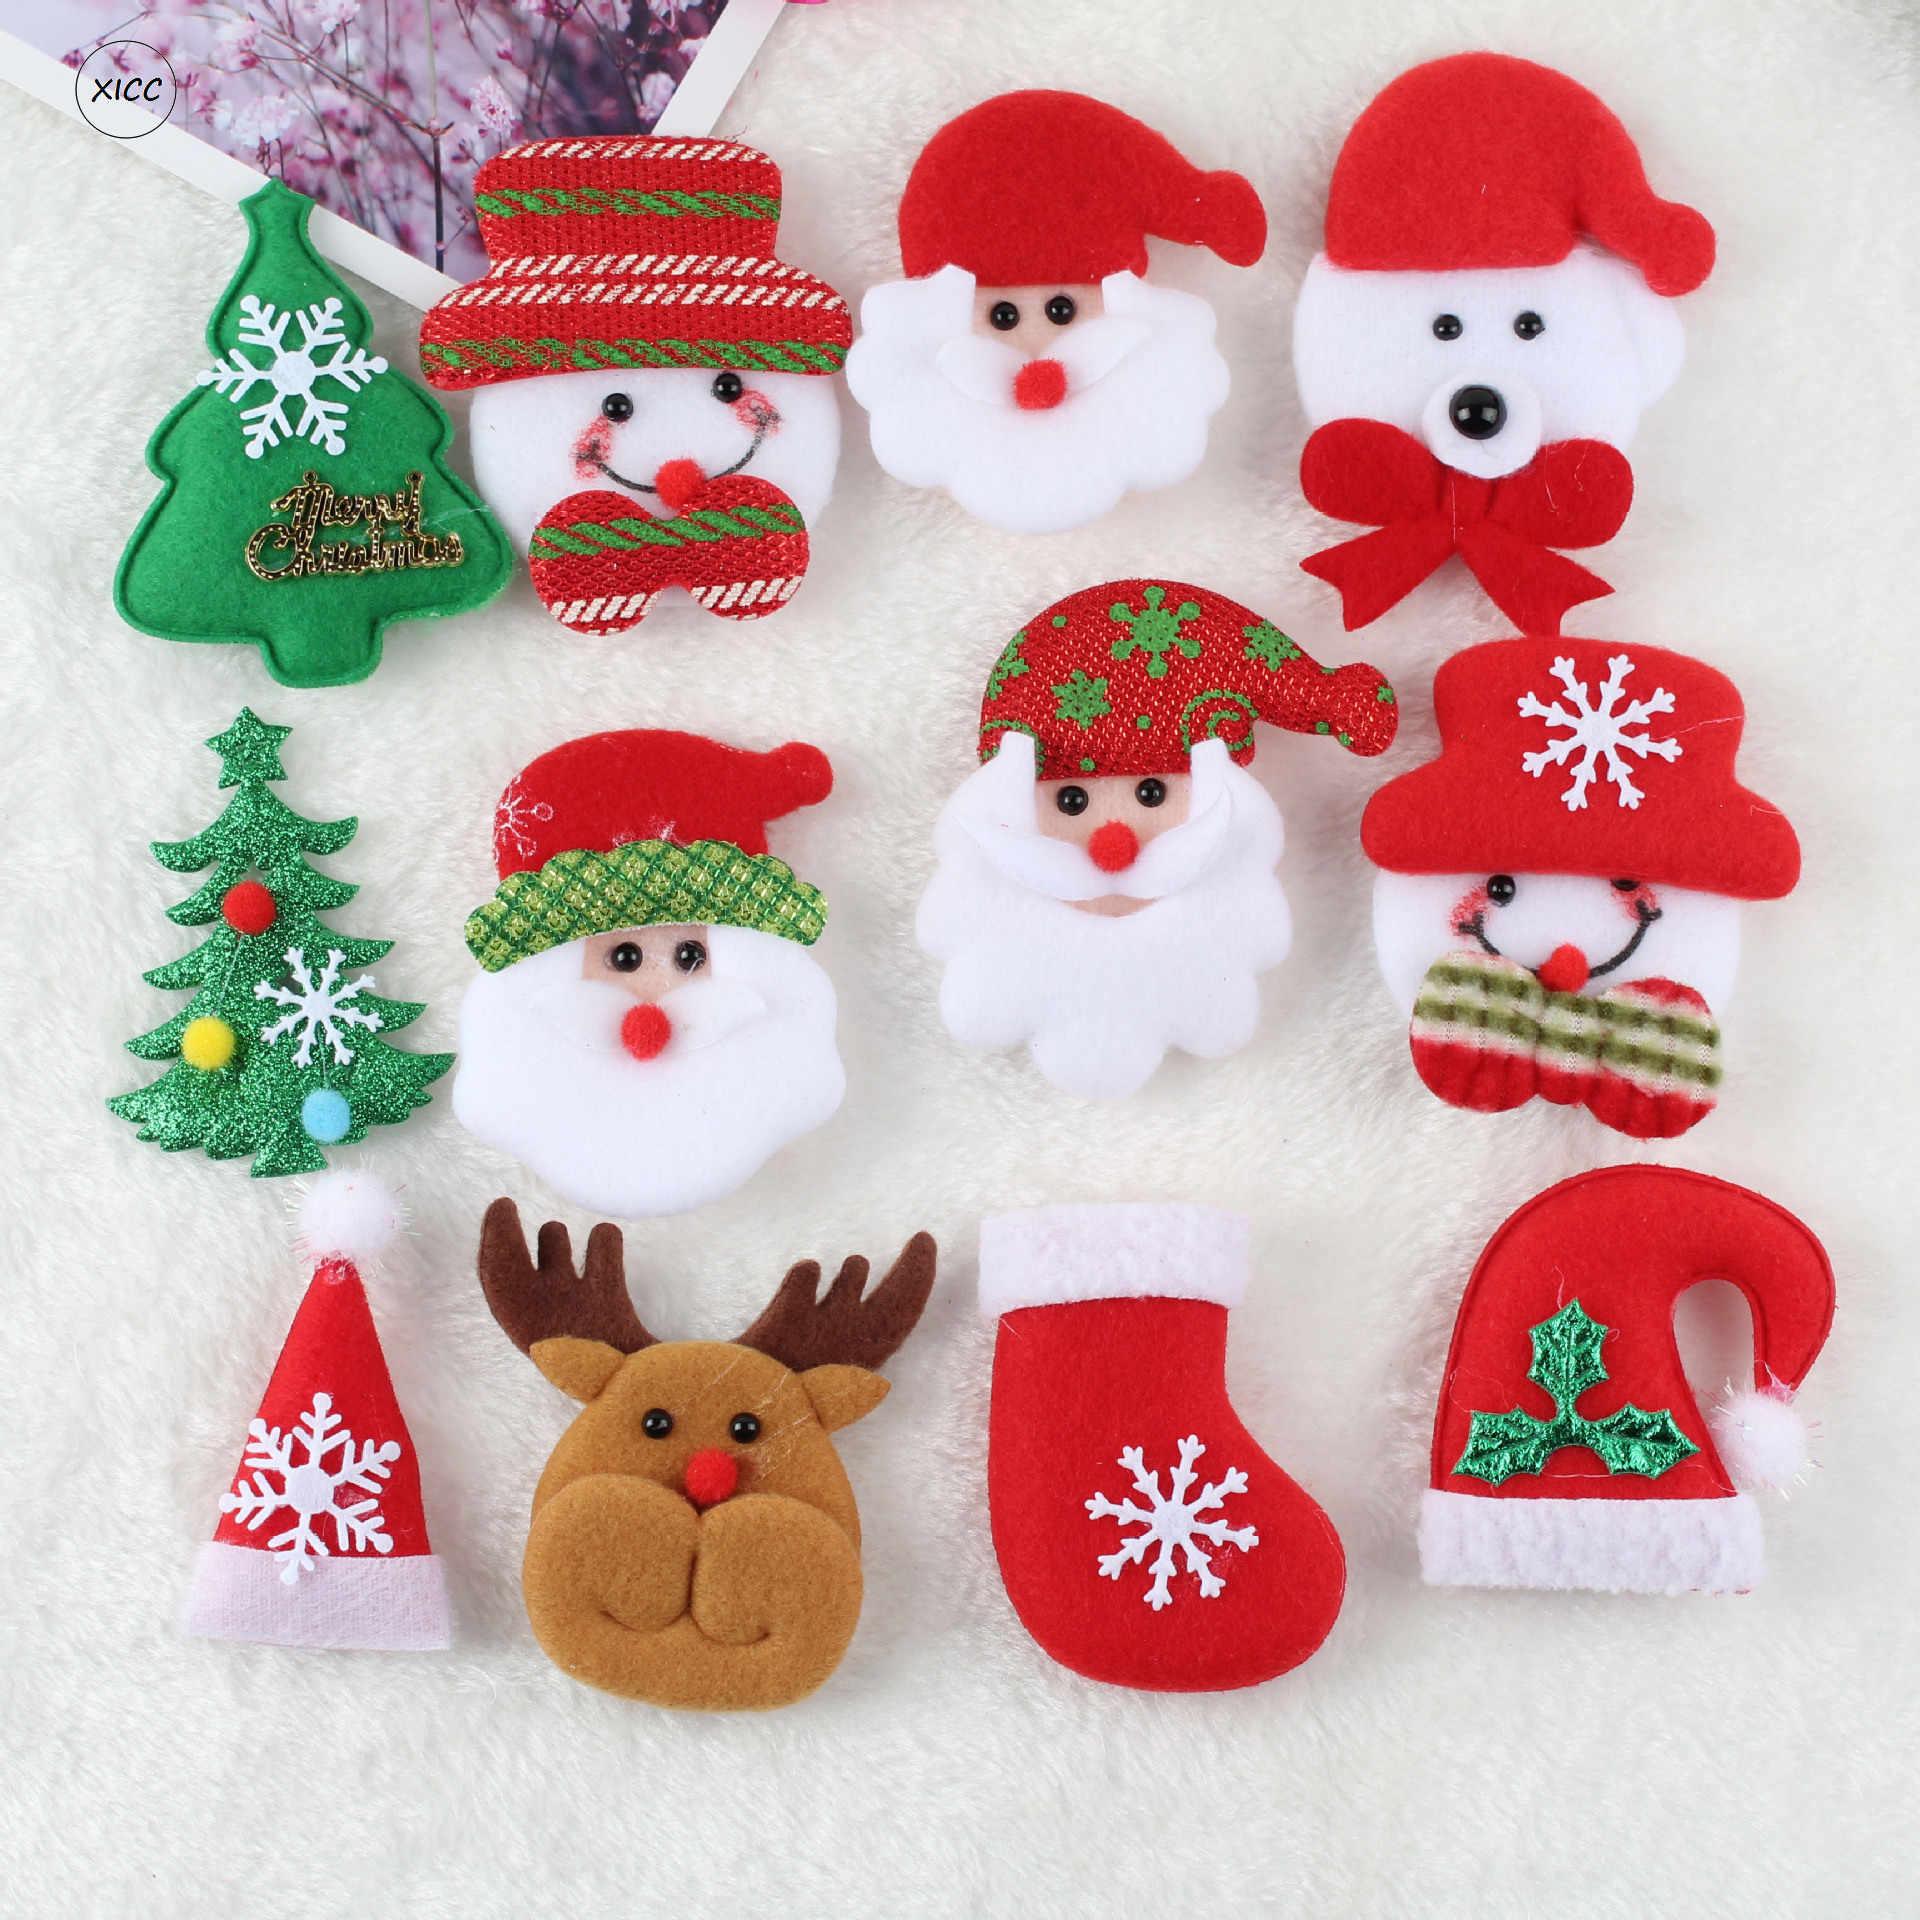 Santa Claus Needle Felted Santa Holiday Decor Hanging Felted Santa Claus-Christmas Christmas Decoration